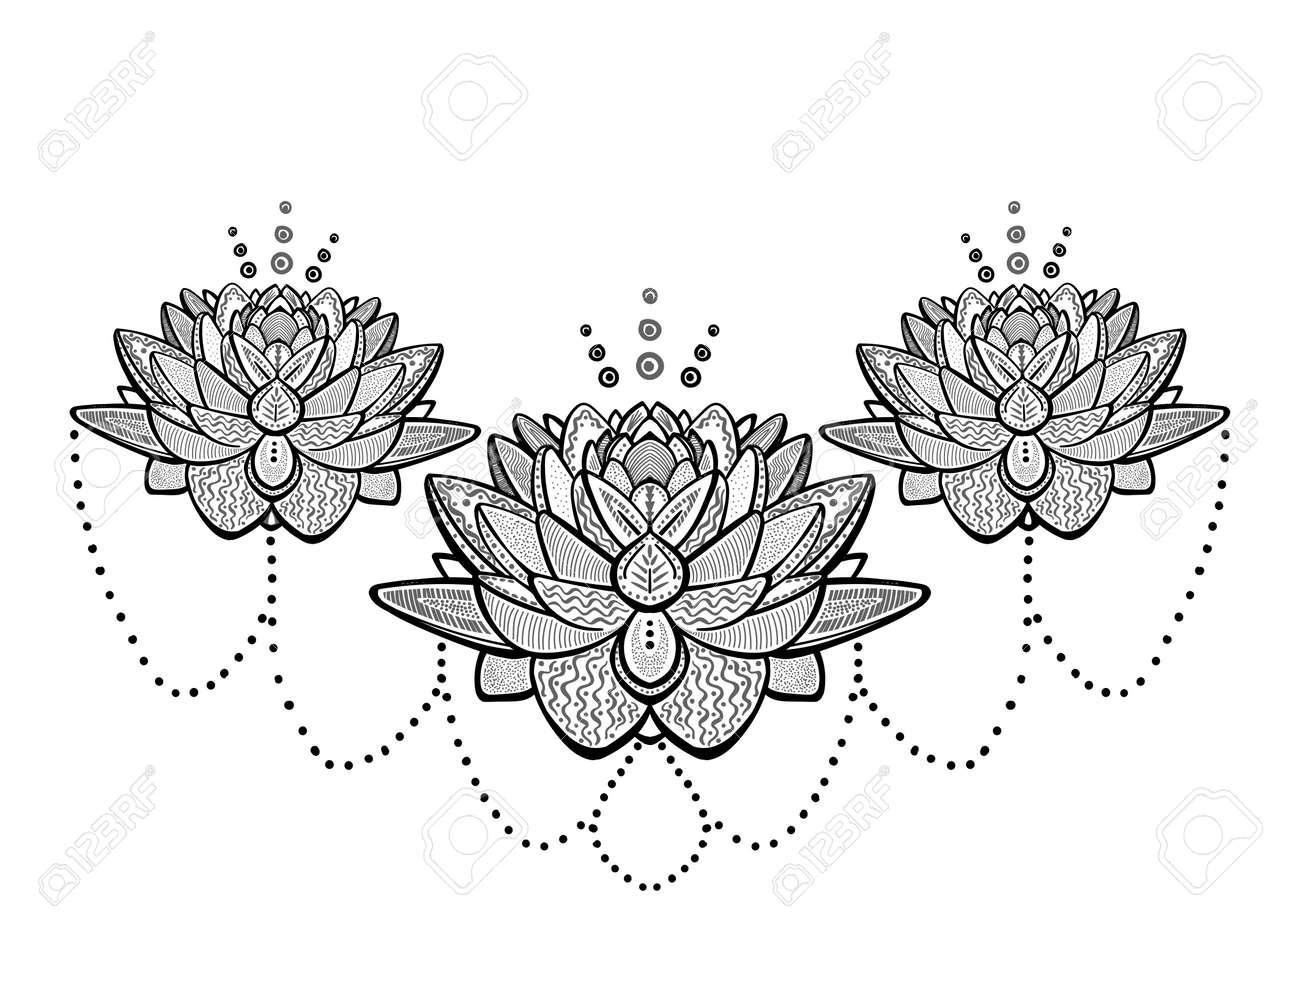 Lotus flowers ornamental tattoo sketch, vector illustration - 128503604